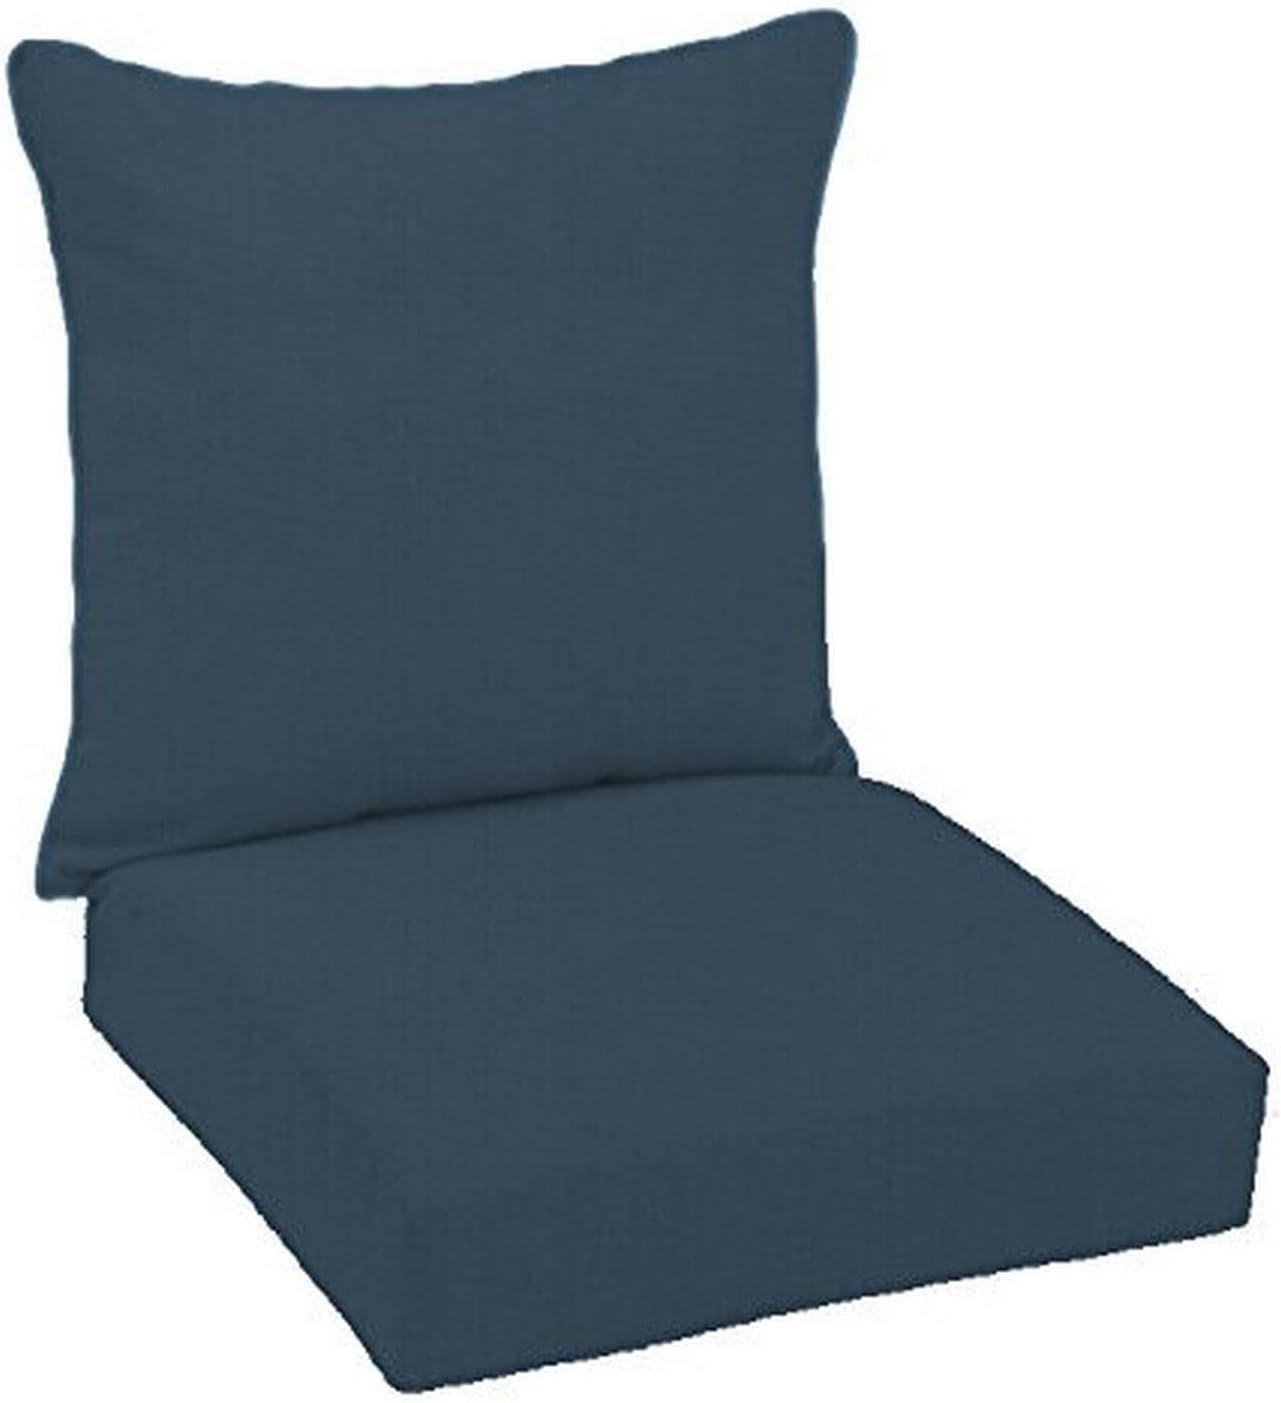 FiberBuilt Umbrellas D0301SB-48080 Hinged Deep Seating Chair Cushion Patio and Lawn Furniture with Sunbrella Fabric, Indigo : Garden & Outdoor